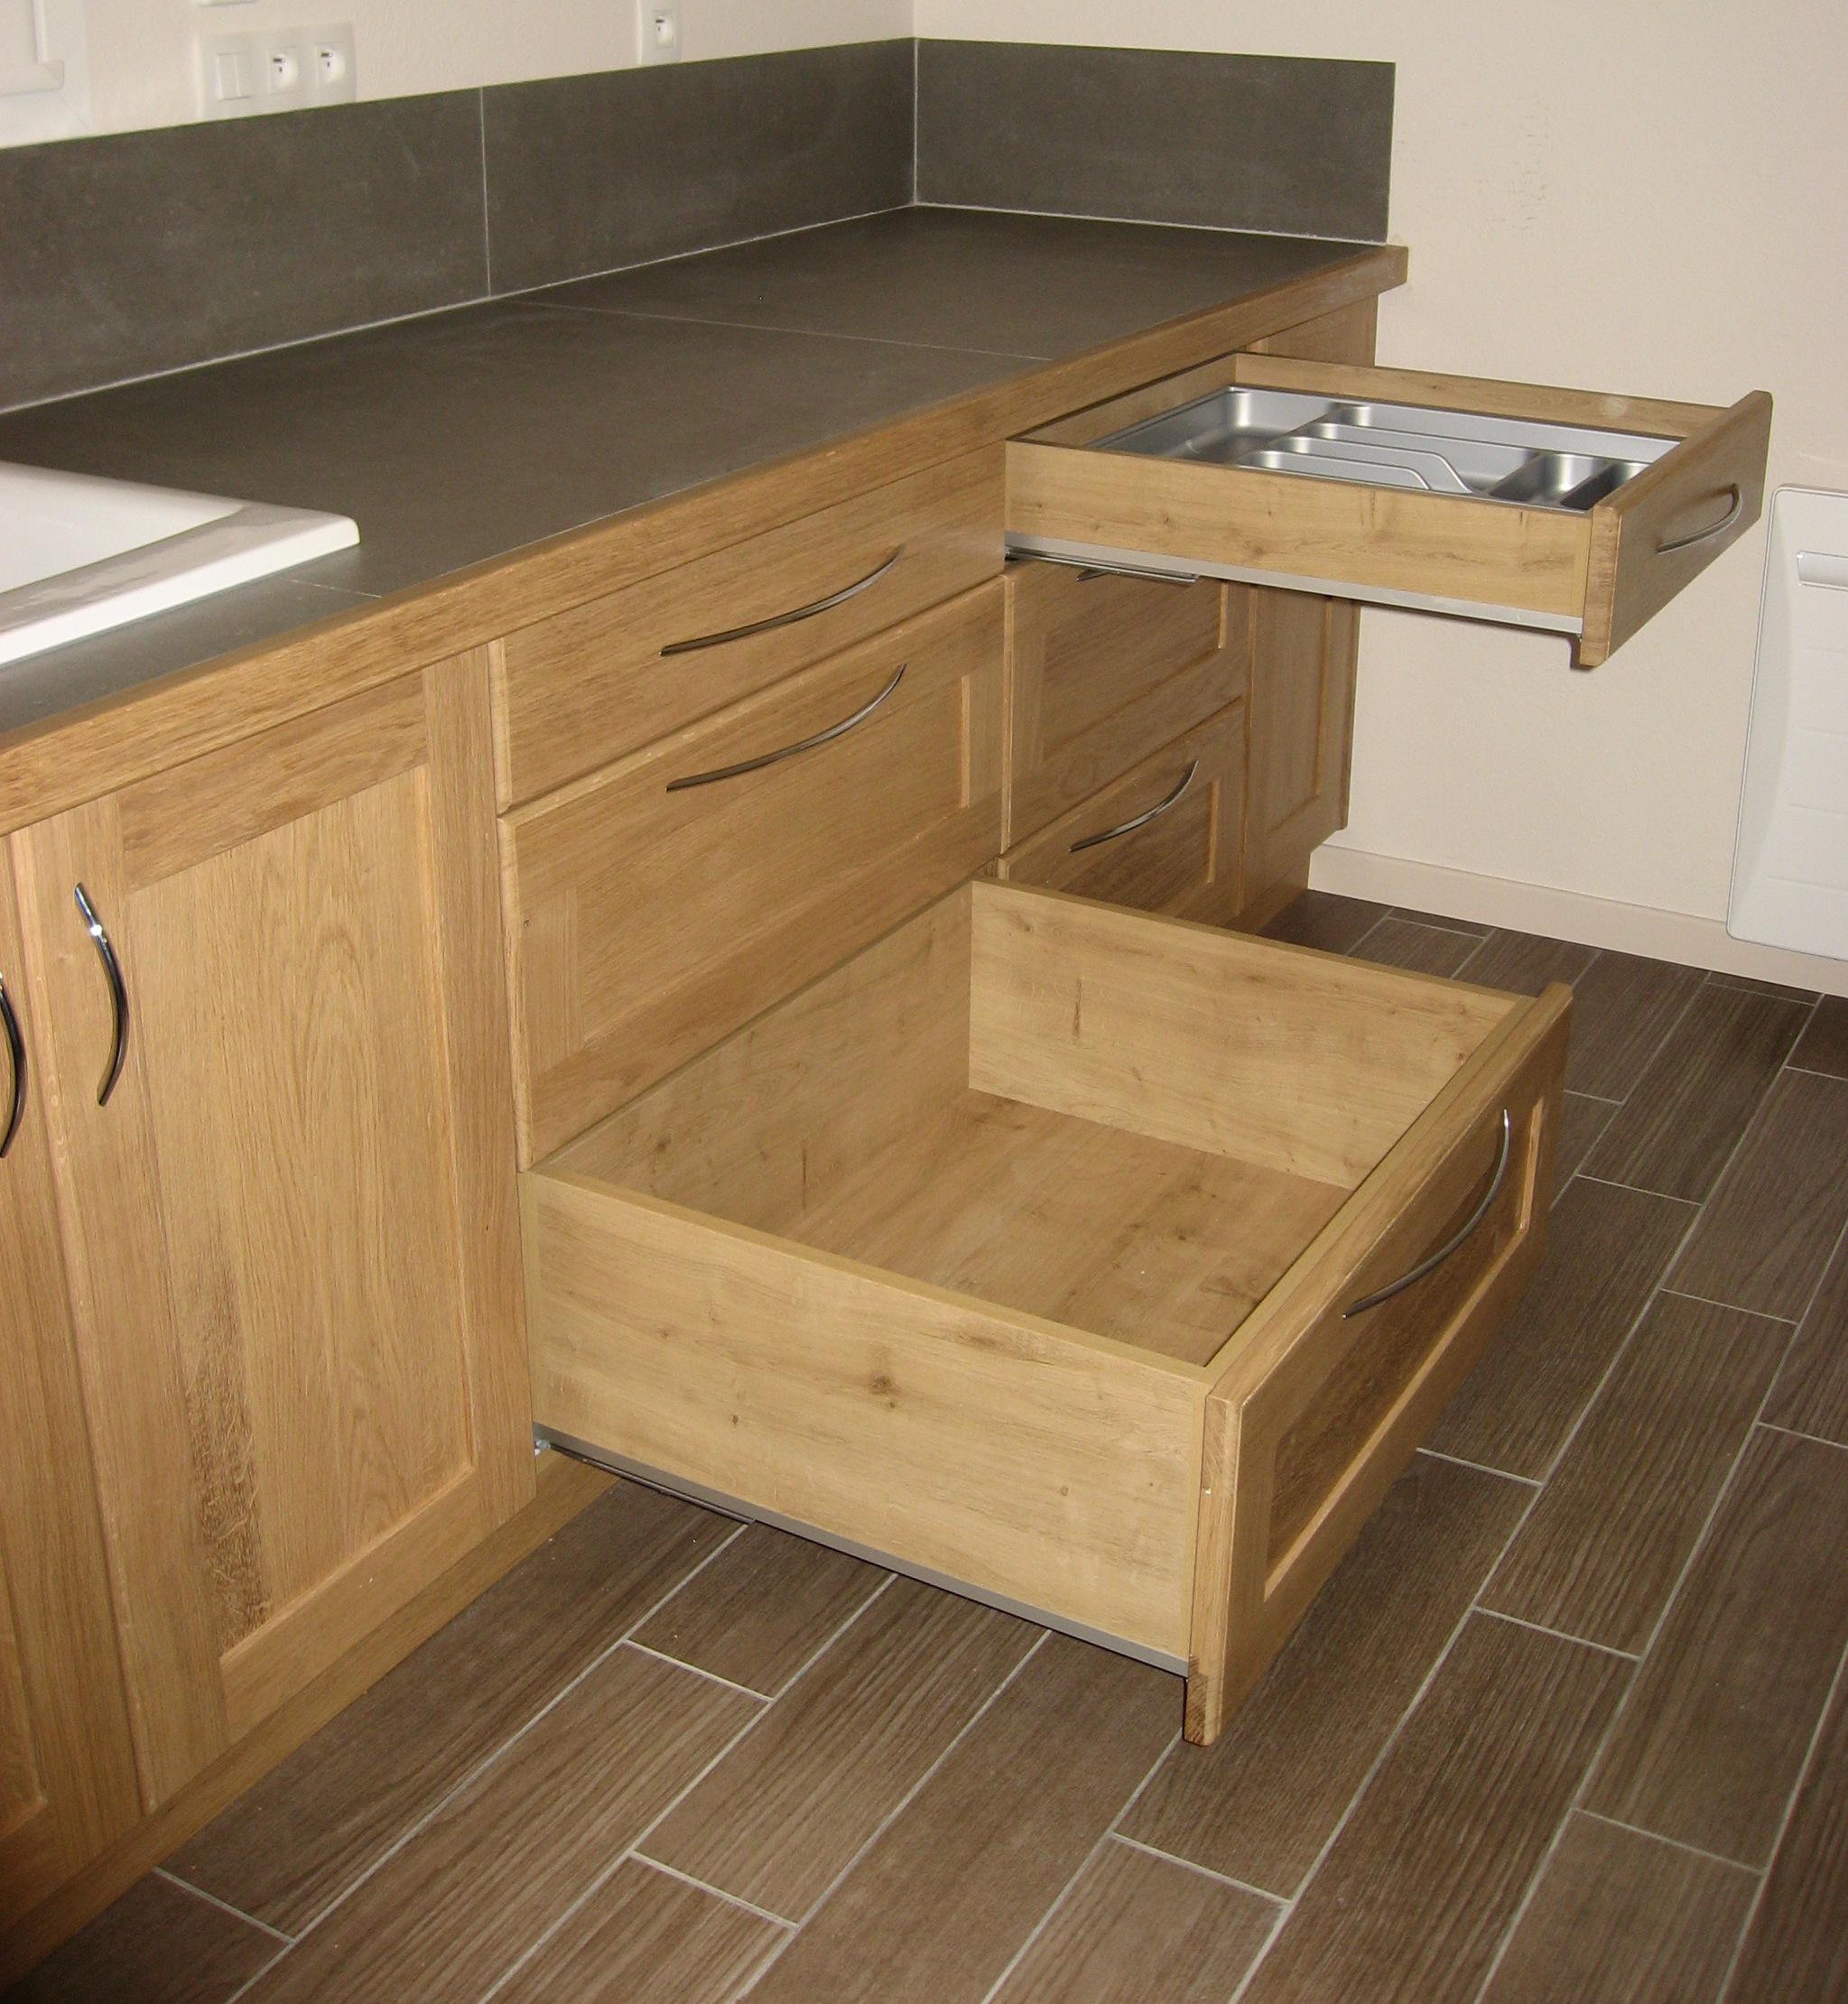 Vernis cuisine 100 images vernis meuble cuisine le for Decaper meuble vernis chene